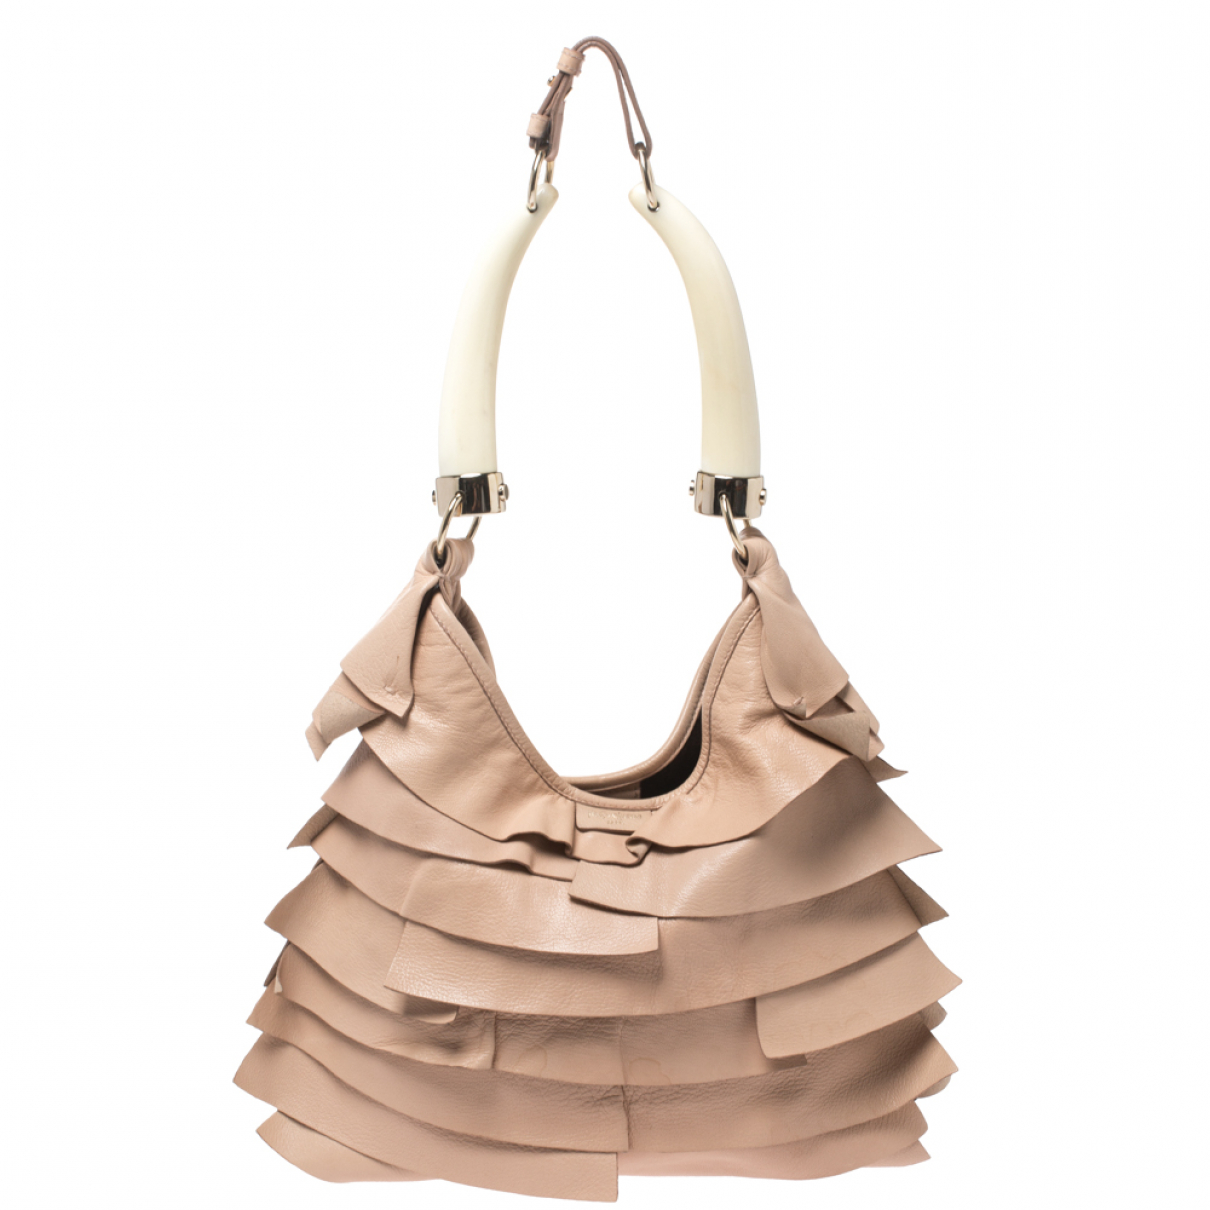 Saint Laurent \N Beige Leather handbag for Women \N